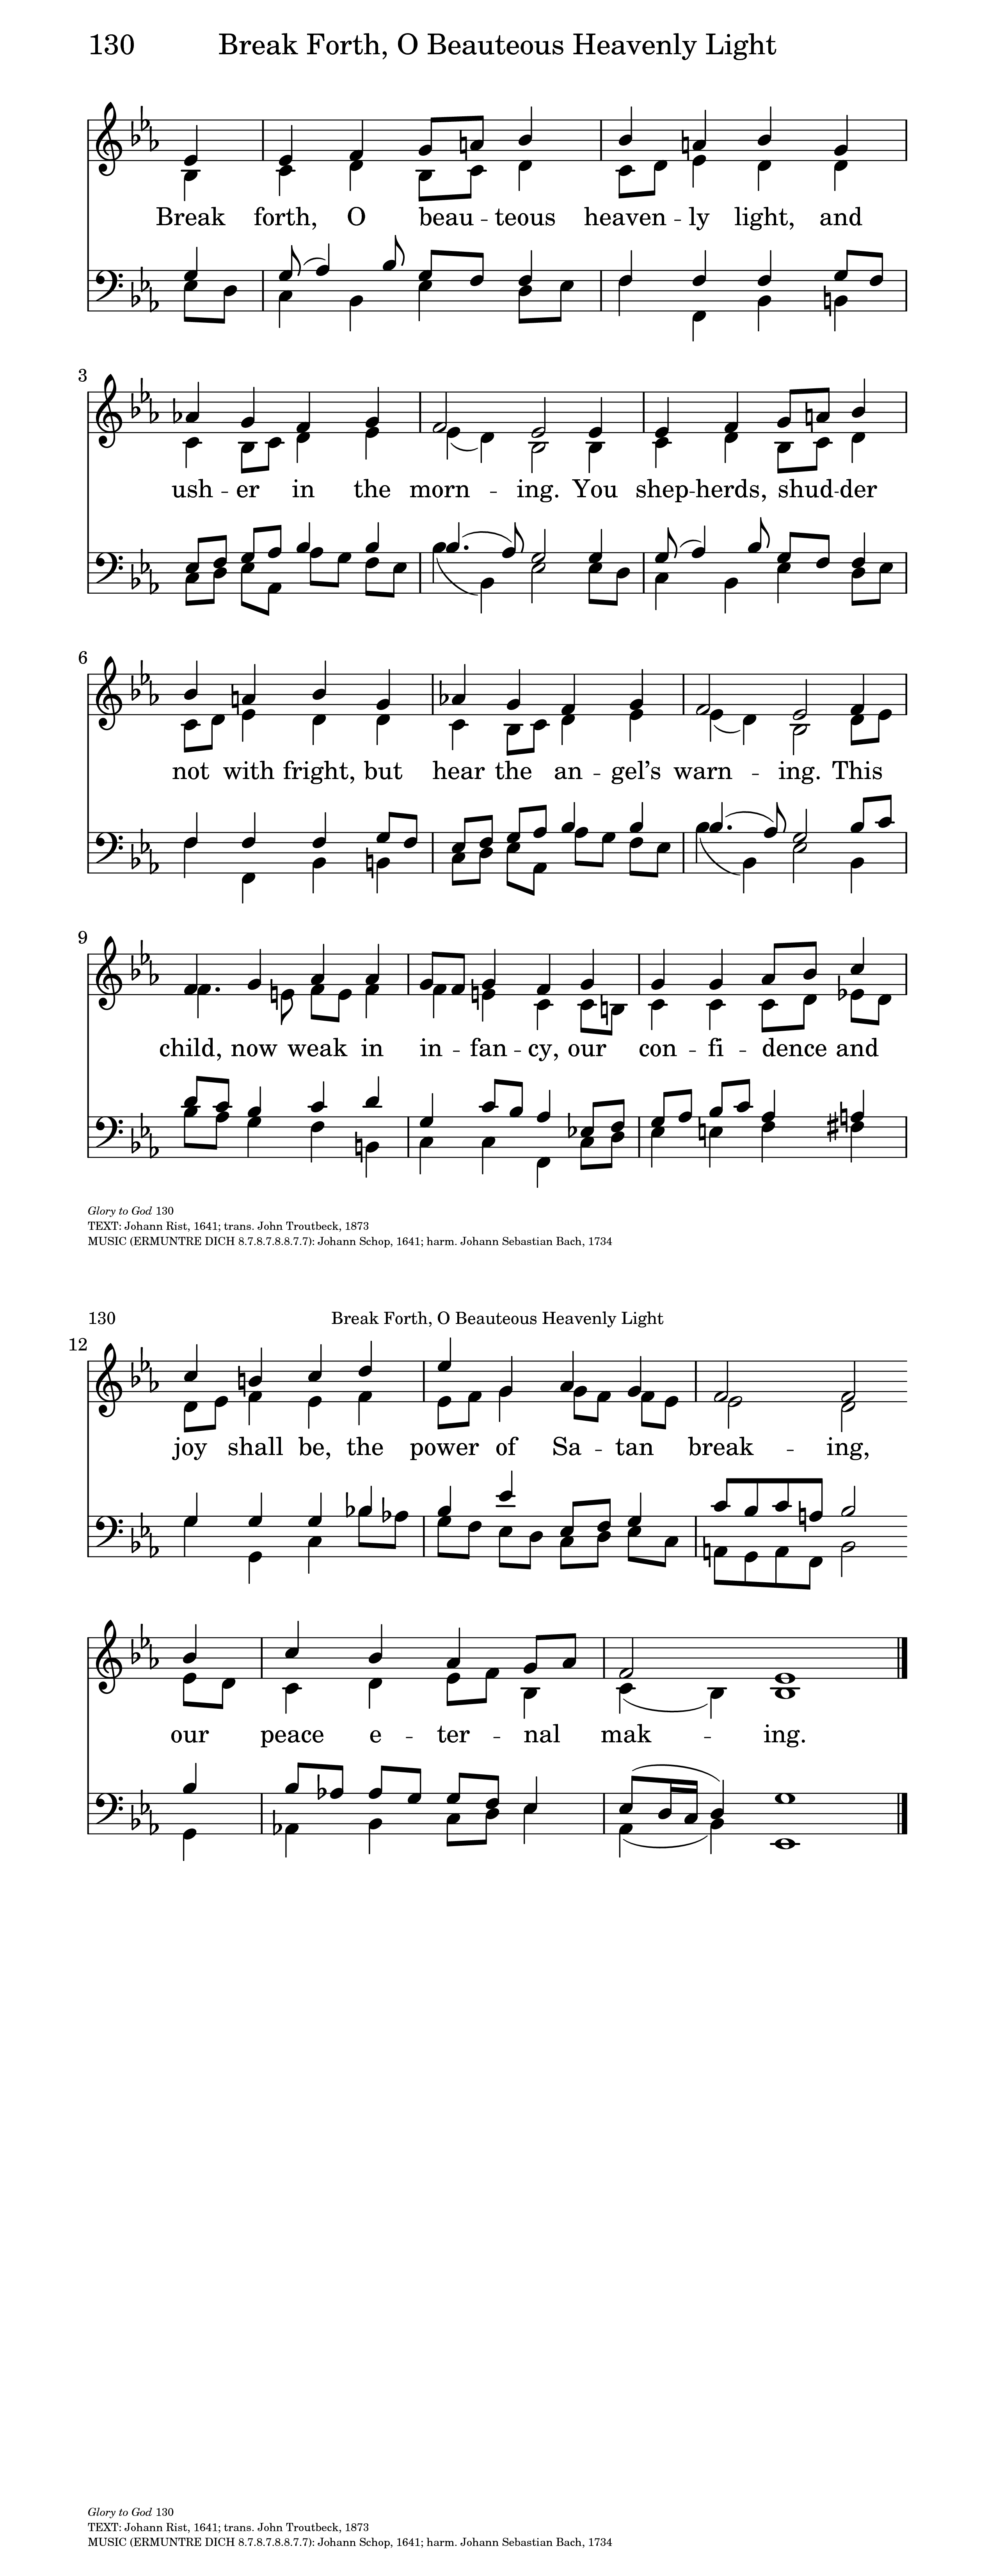 Break Forth, O Beauteous Heavenly Light | Hymnary org